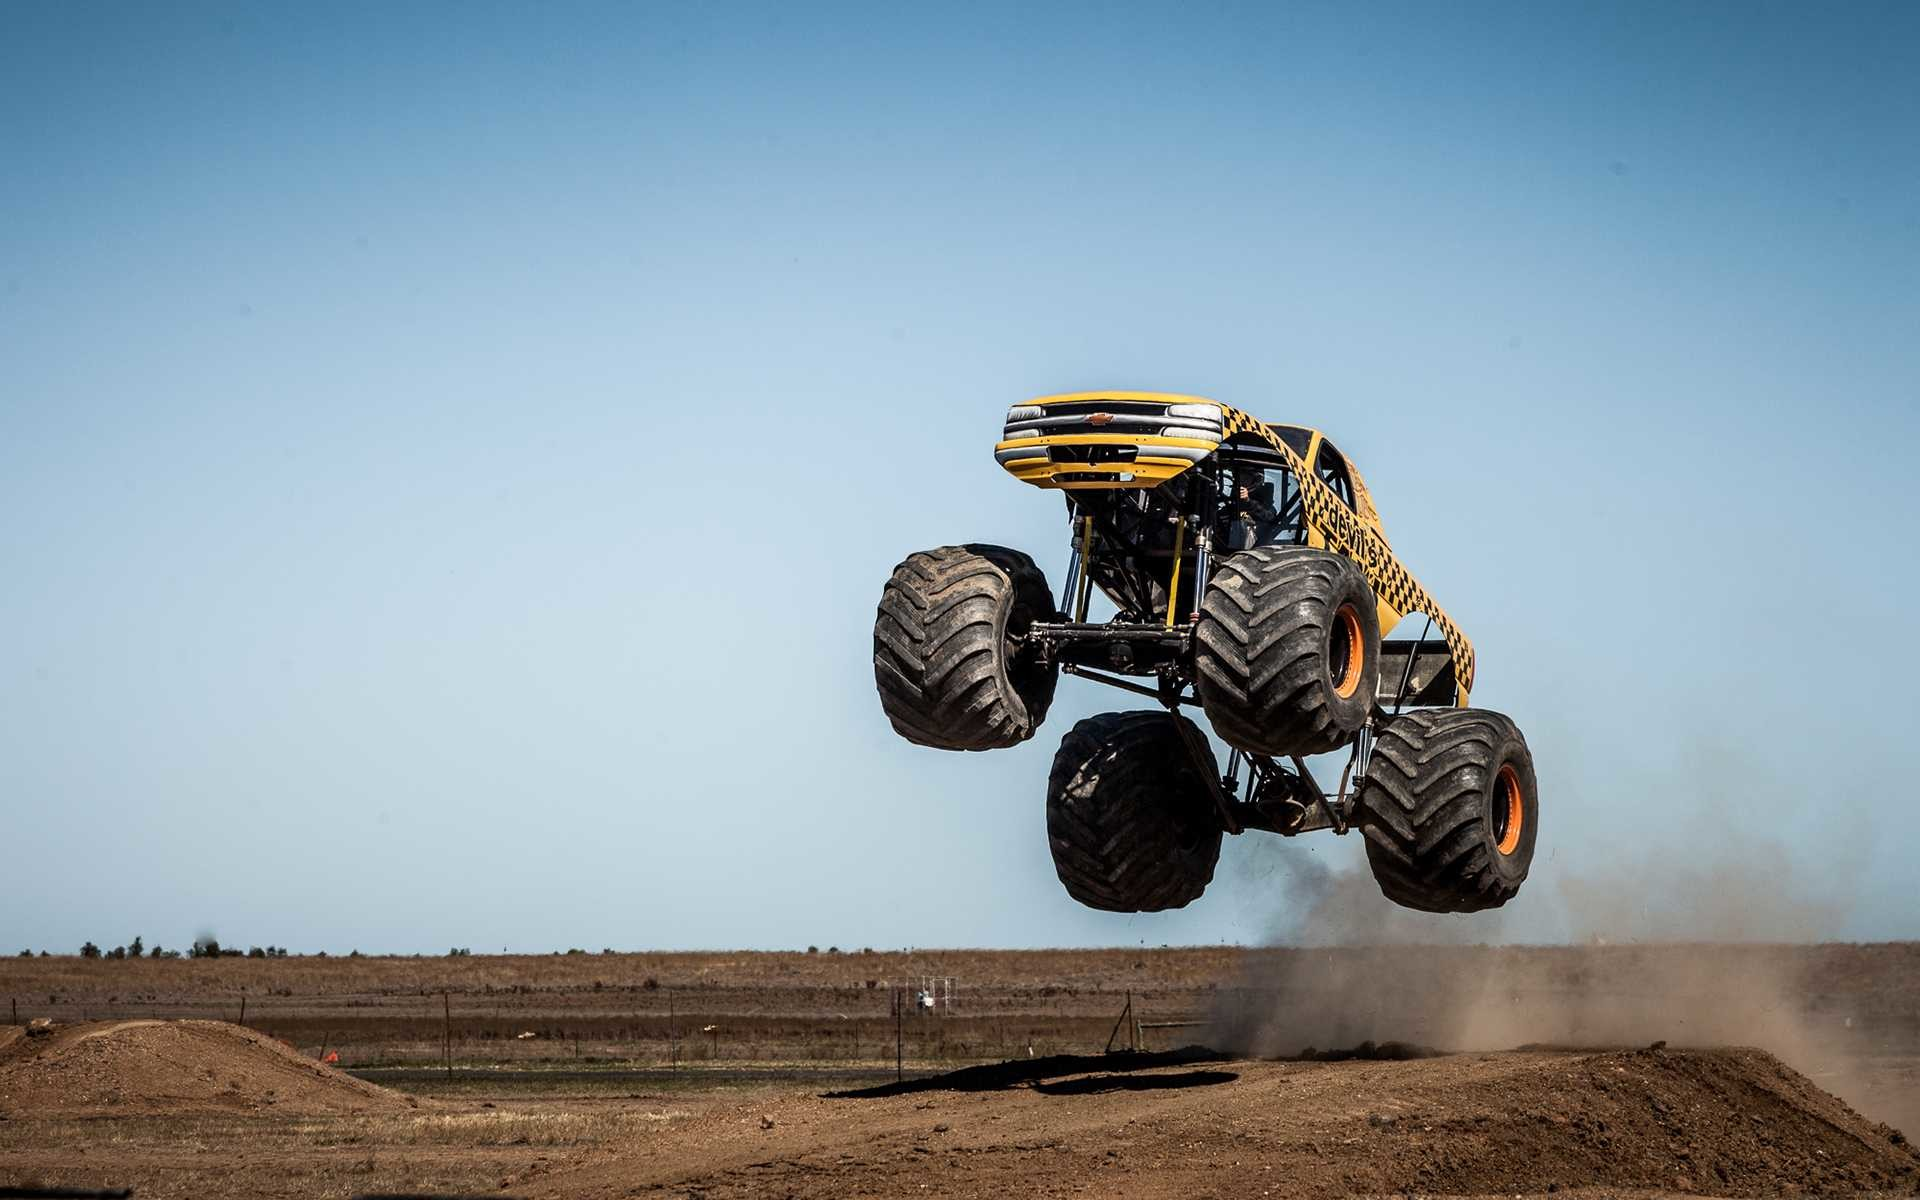 Res: 1920x1200, High Resolution Of Monster Truck Jump Stop Action Wallpaper Hd Desktop